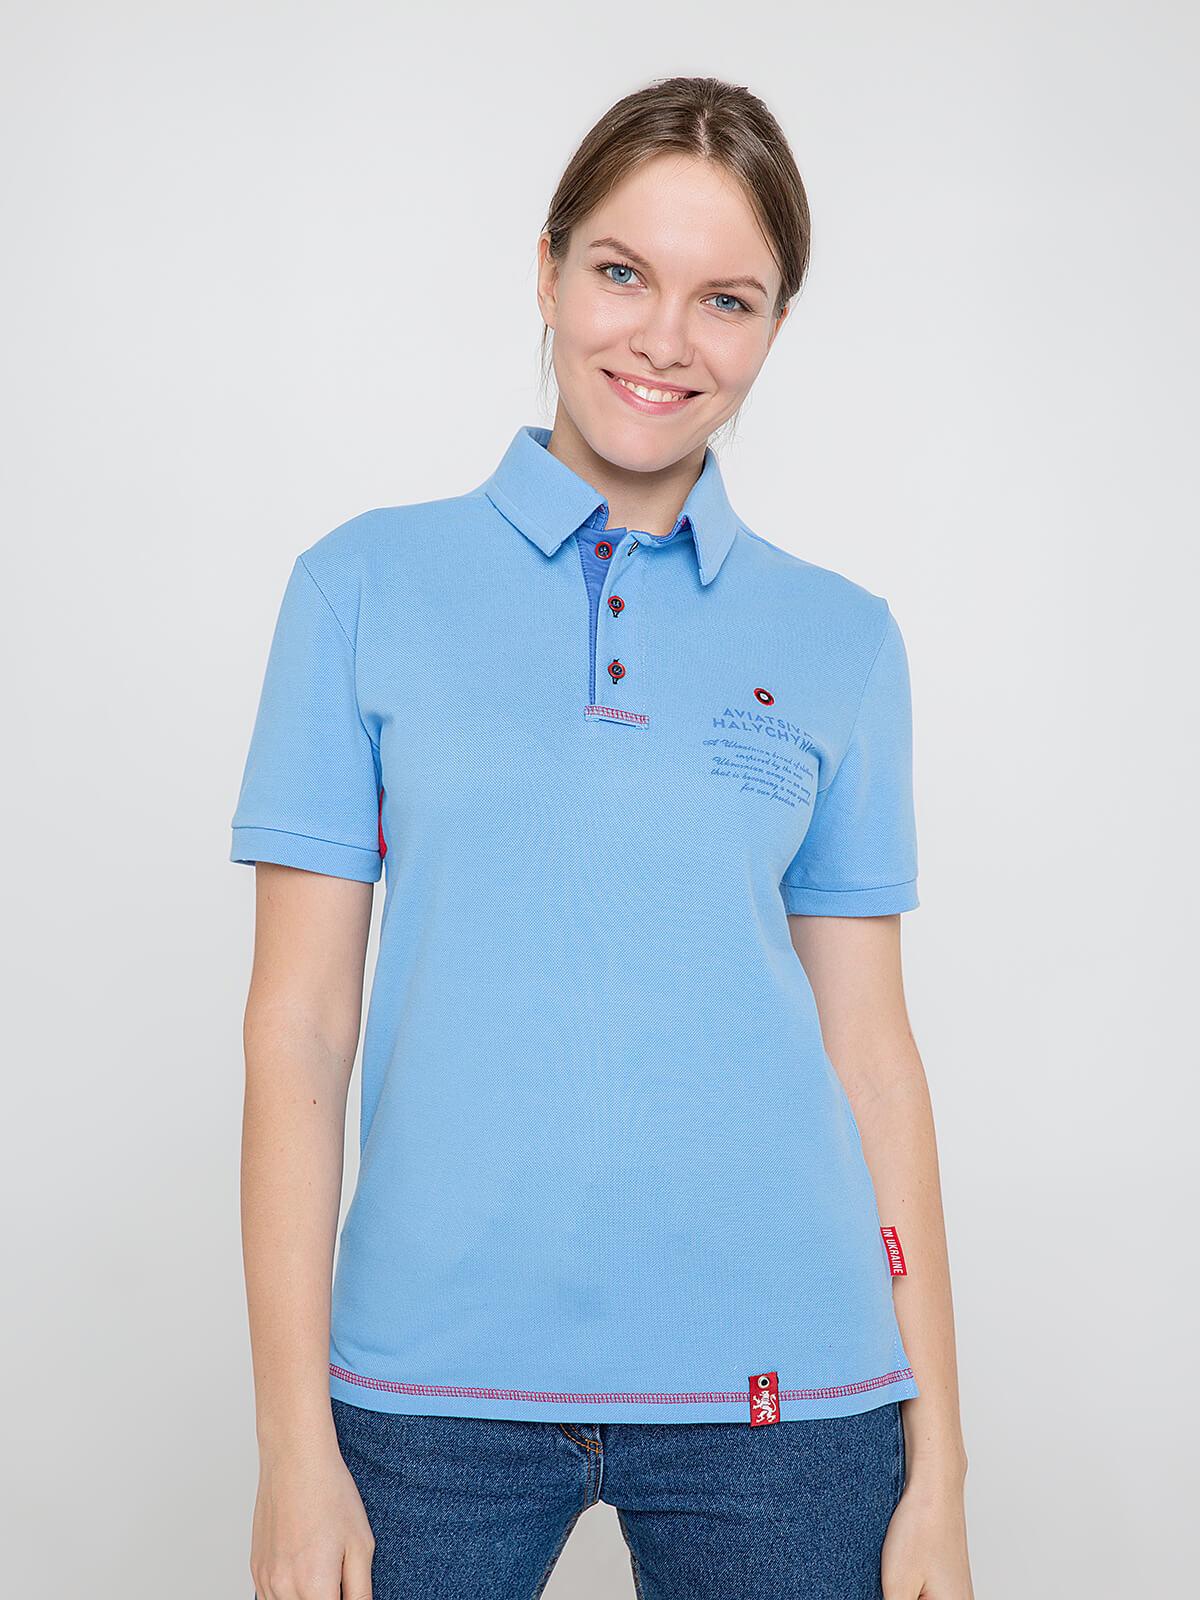 Women's Polo Shirt Wings. Color sky blue. Unisex polo (men's sizes).